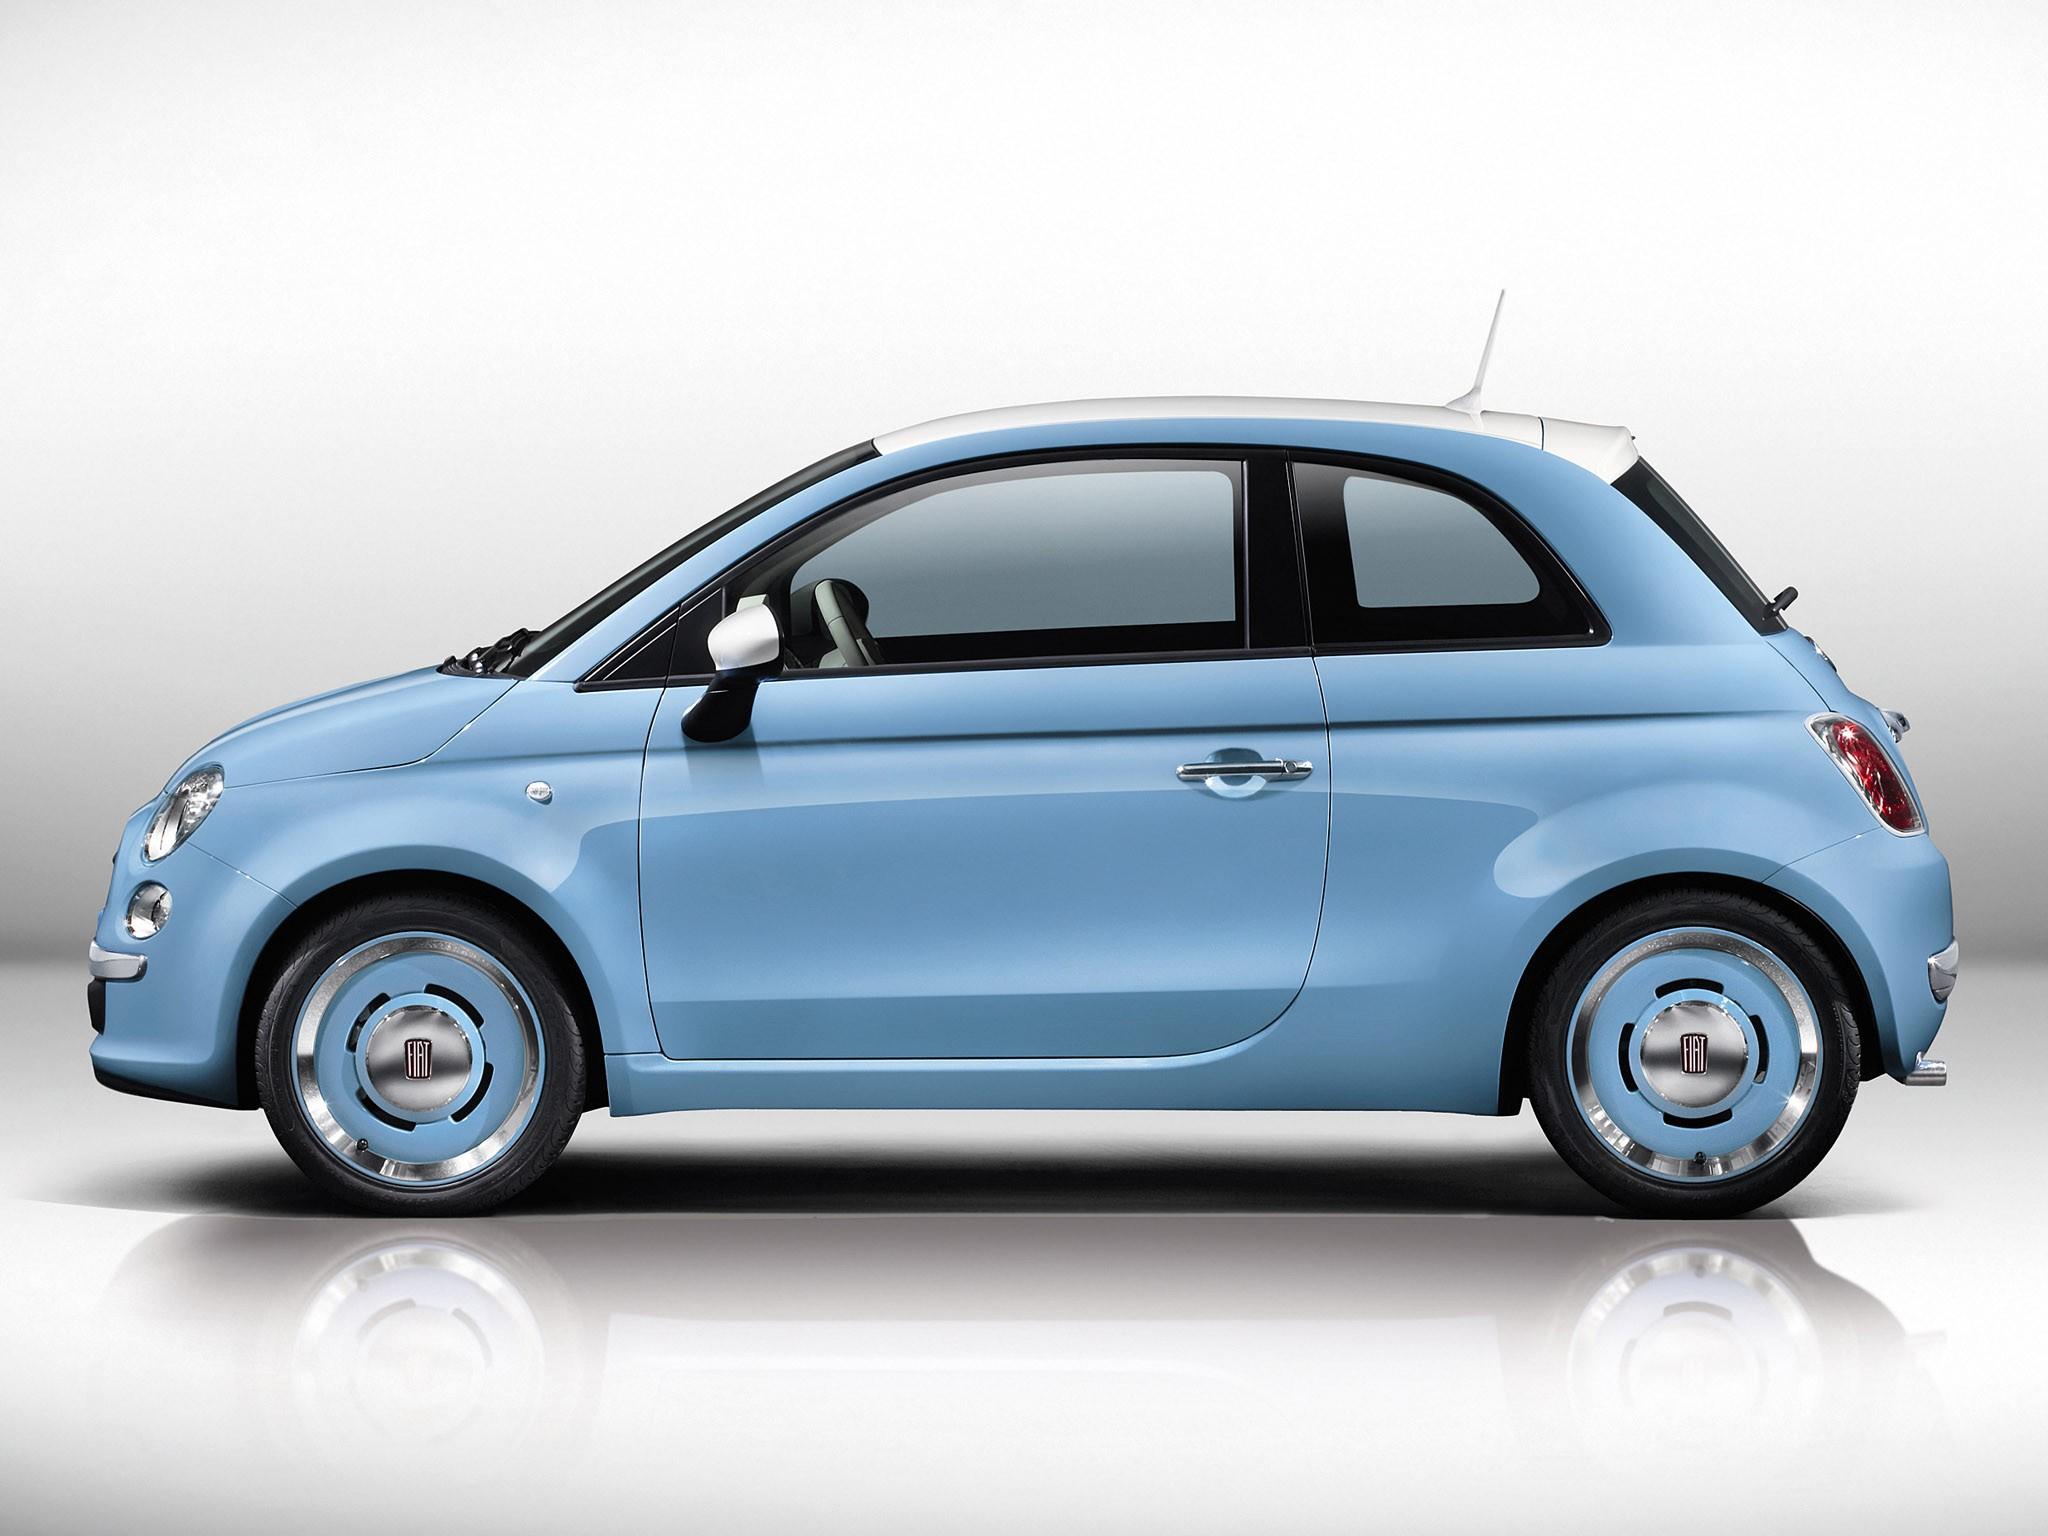 Fiat 500 Vintage 1957 Concept 2014 - Photoscar